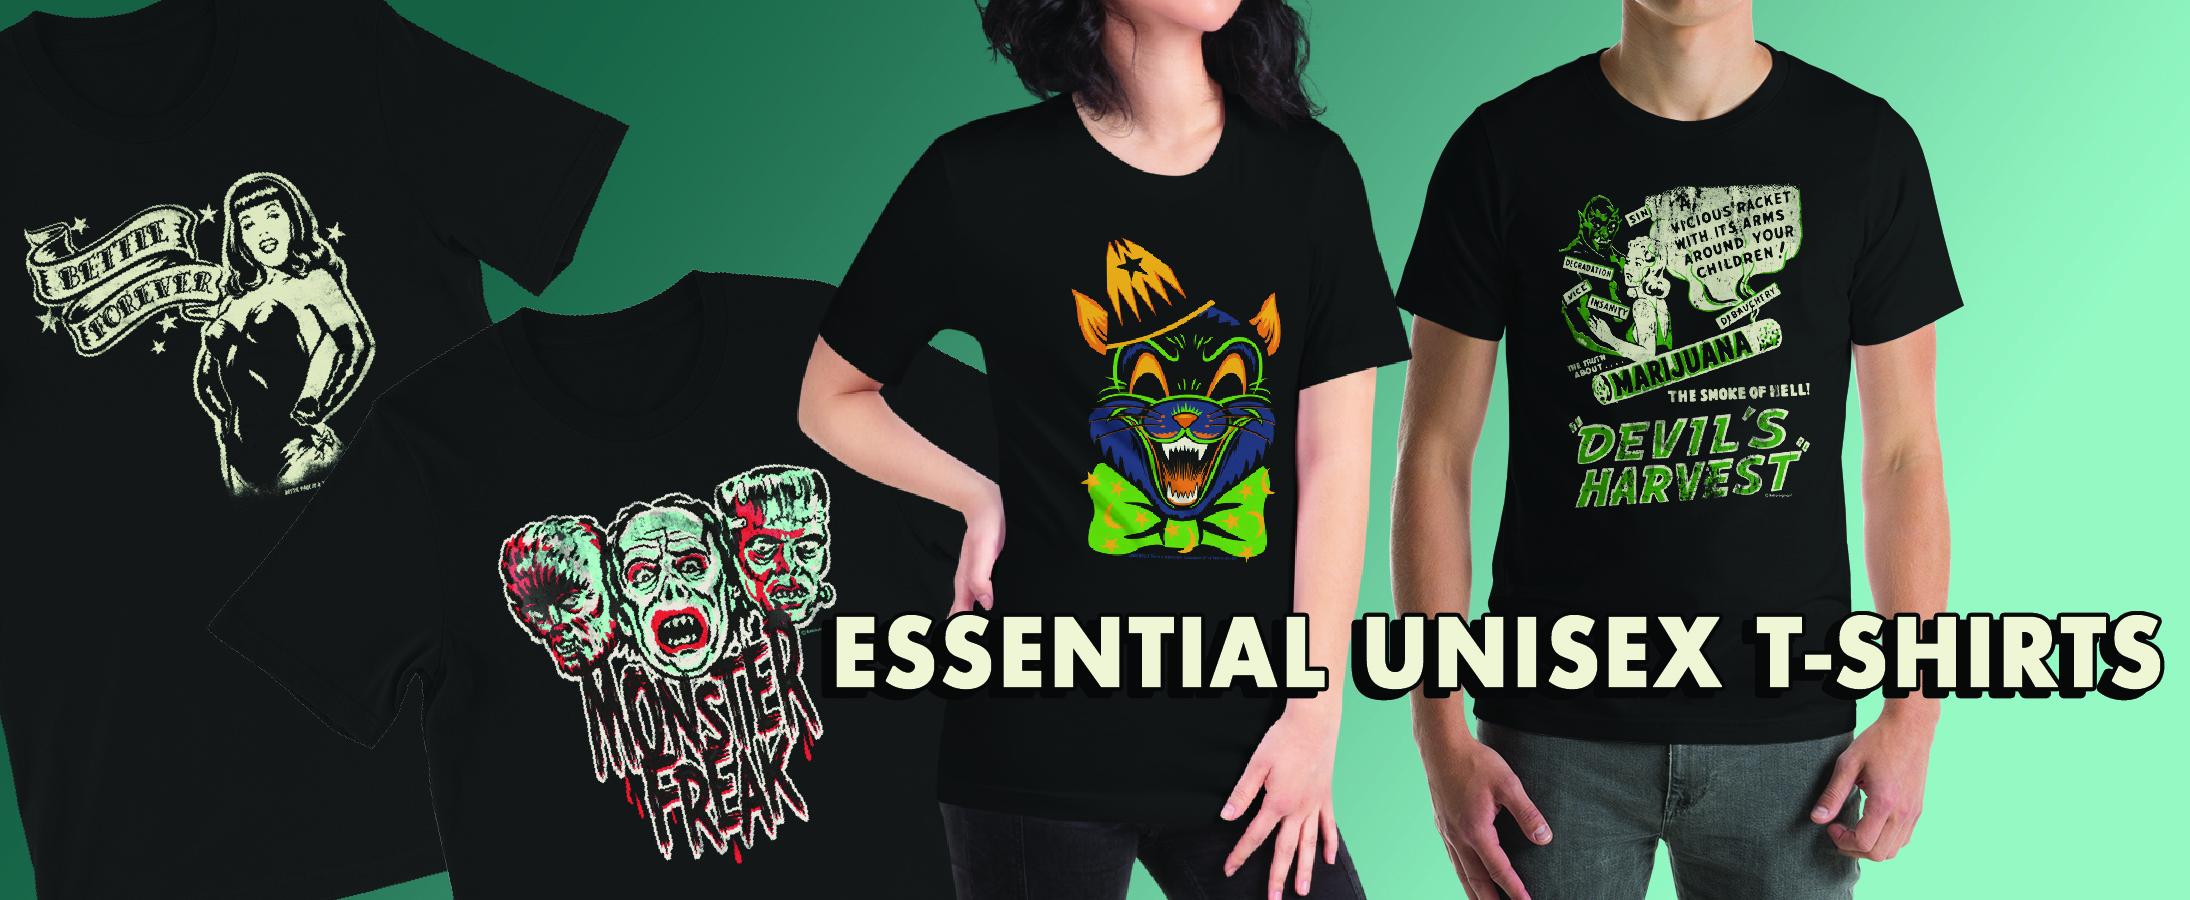 unisex-tshirt-header.jpg